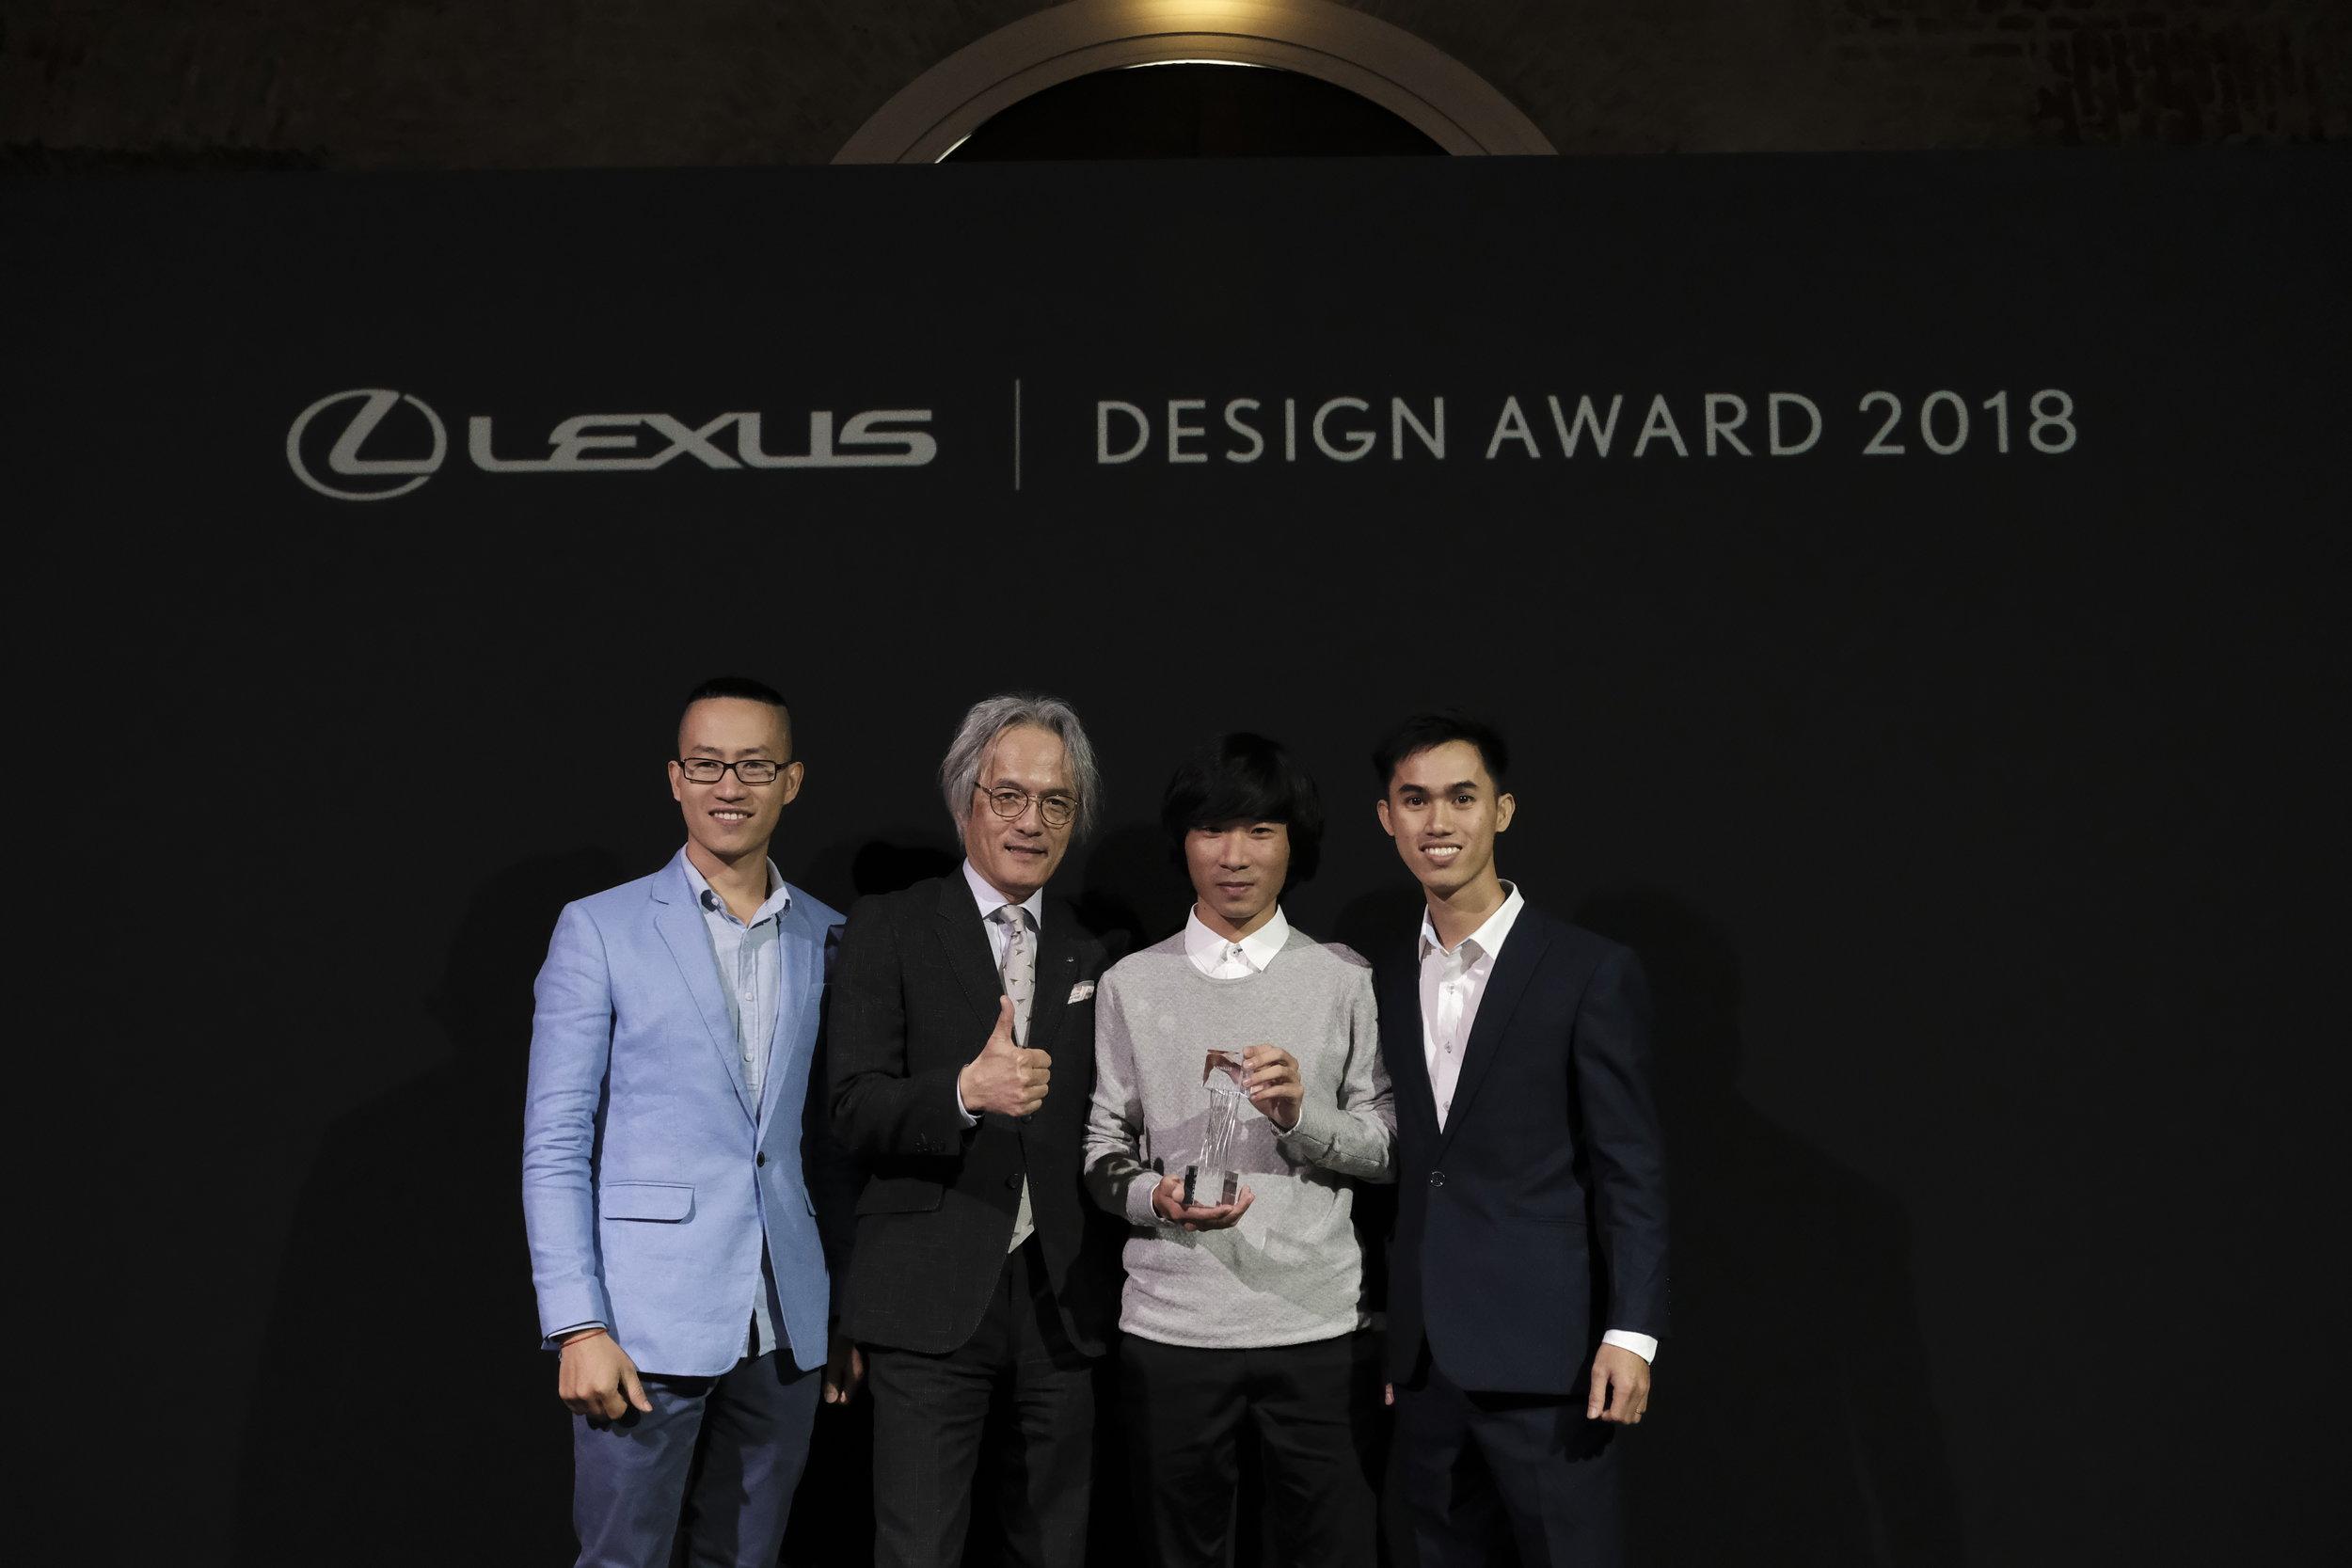 Mr. Yoshihiro Sawa (President, Lexus International) among VNWALLS team members